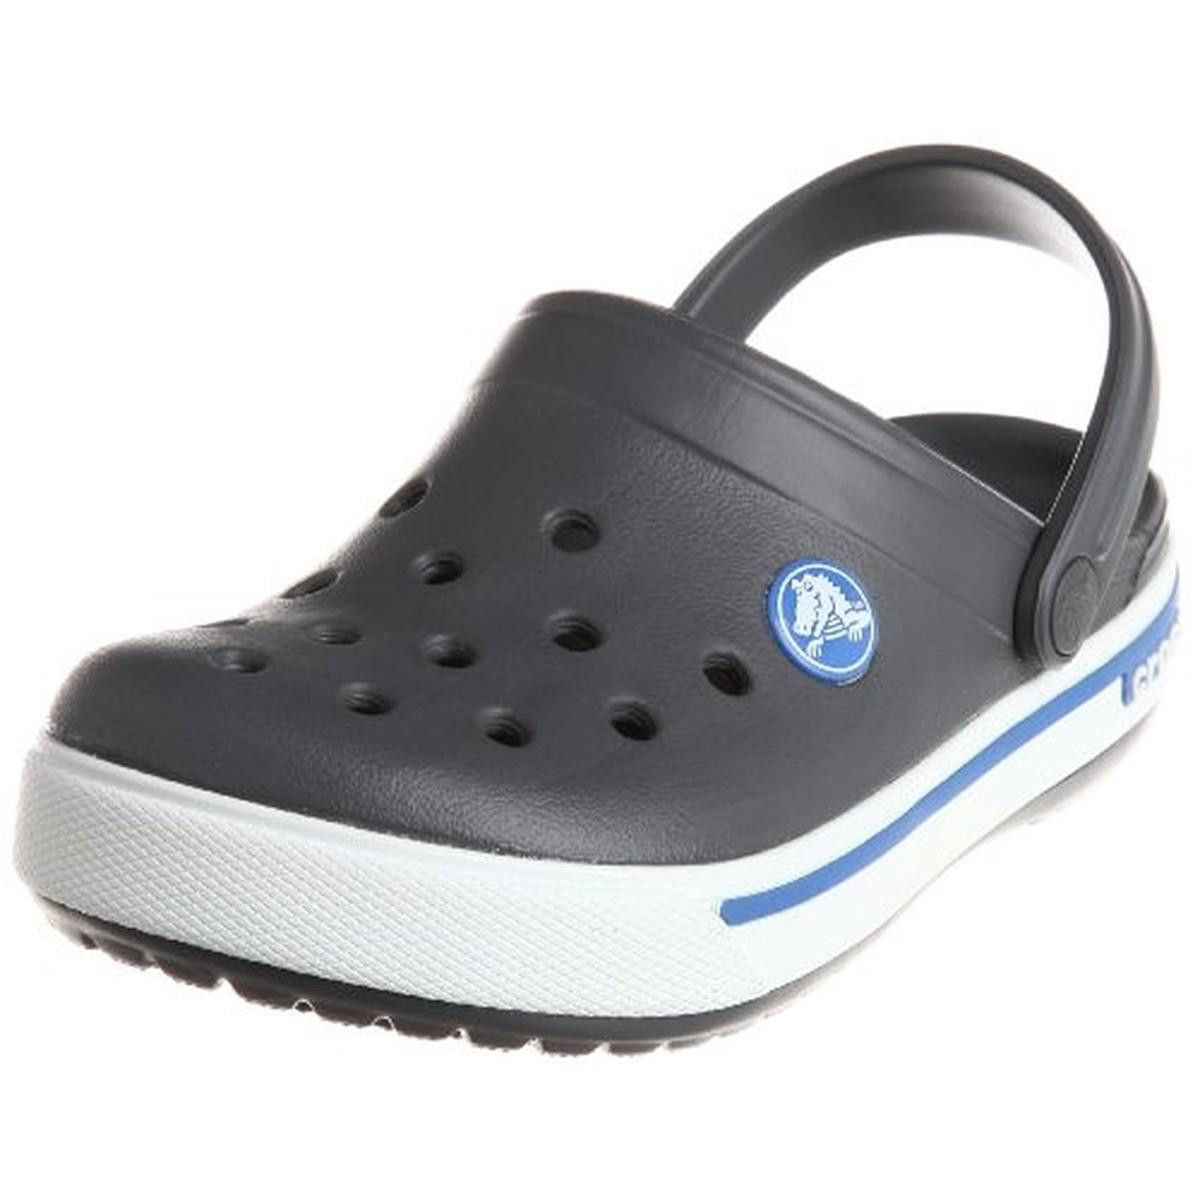 97d471ea9e2eb Crocs Boys Crocband II.5 Perforated Slip On Clogs | Products | Crocs ...